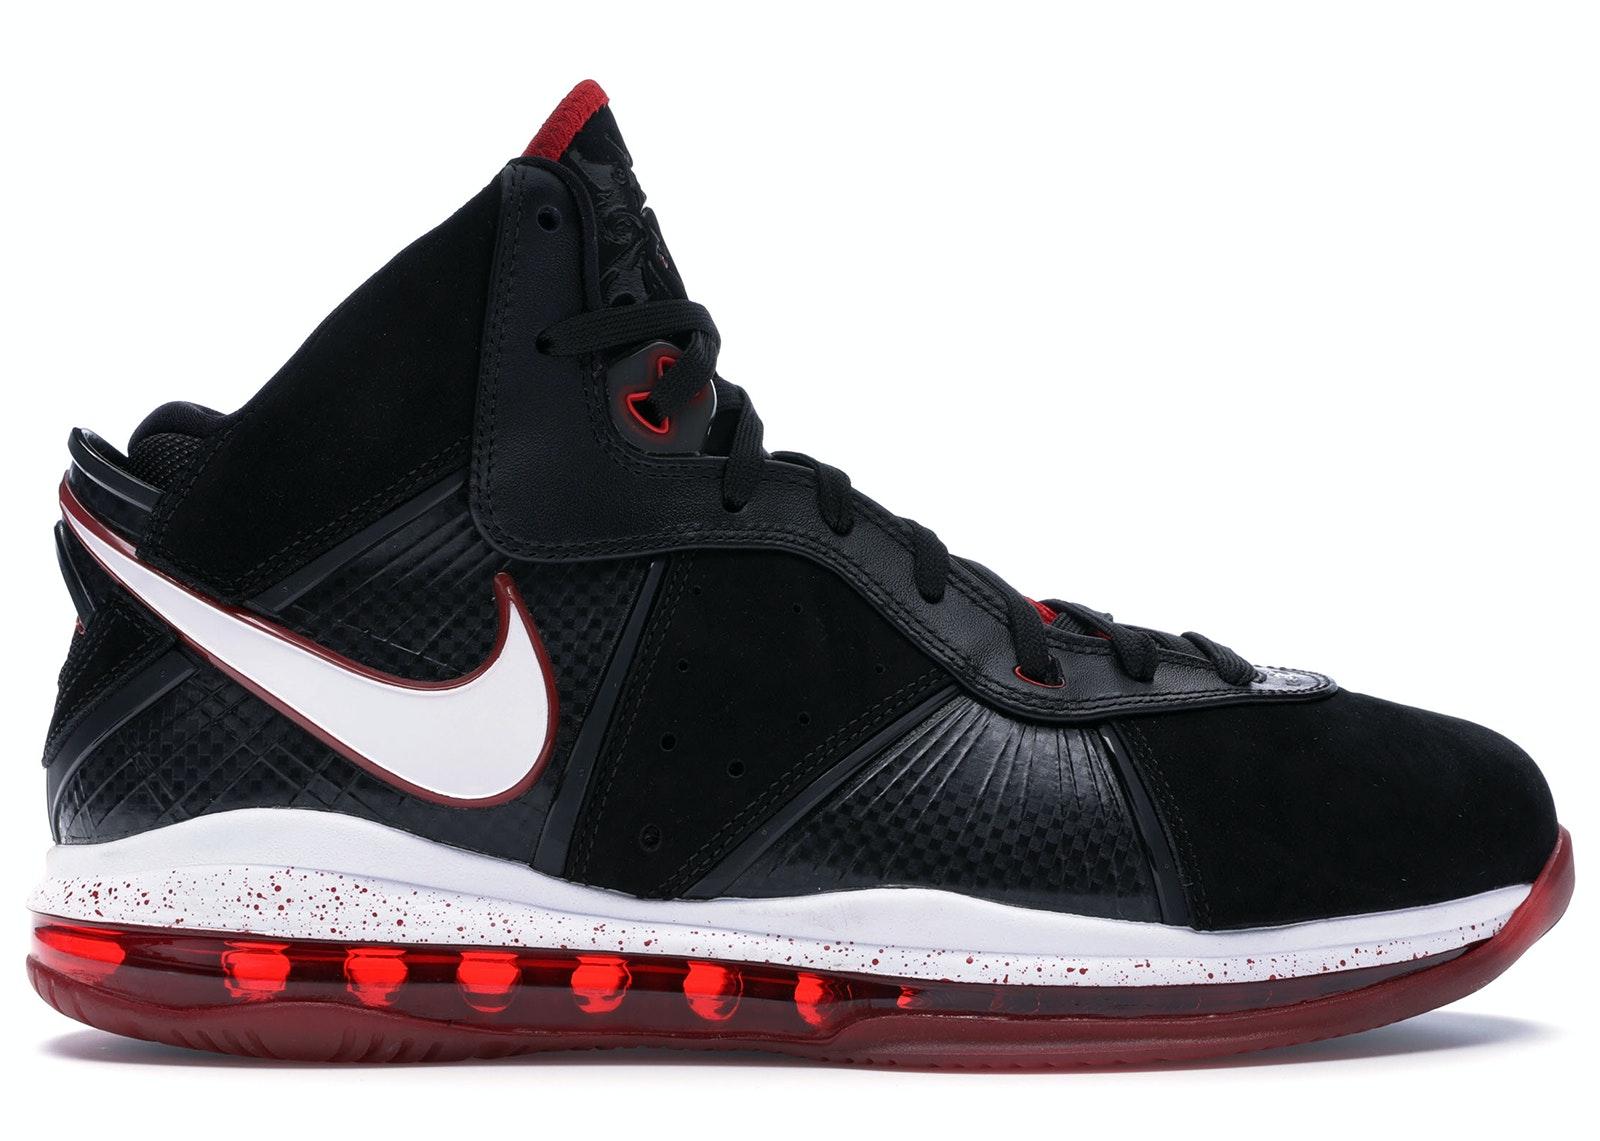 LeBron 8 Black/White/Red